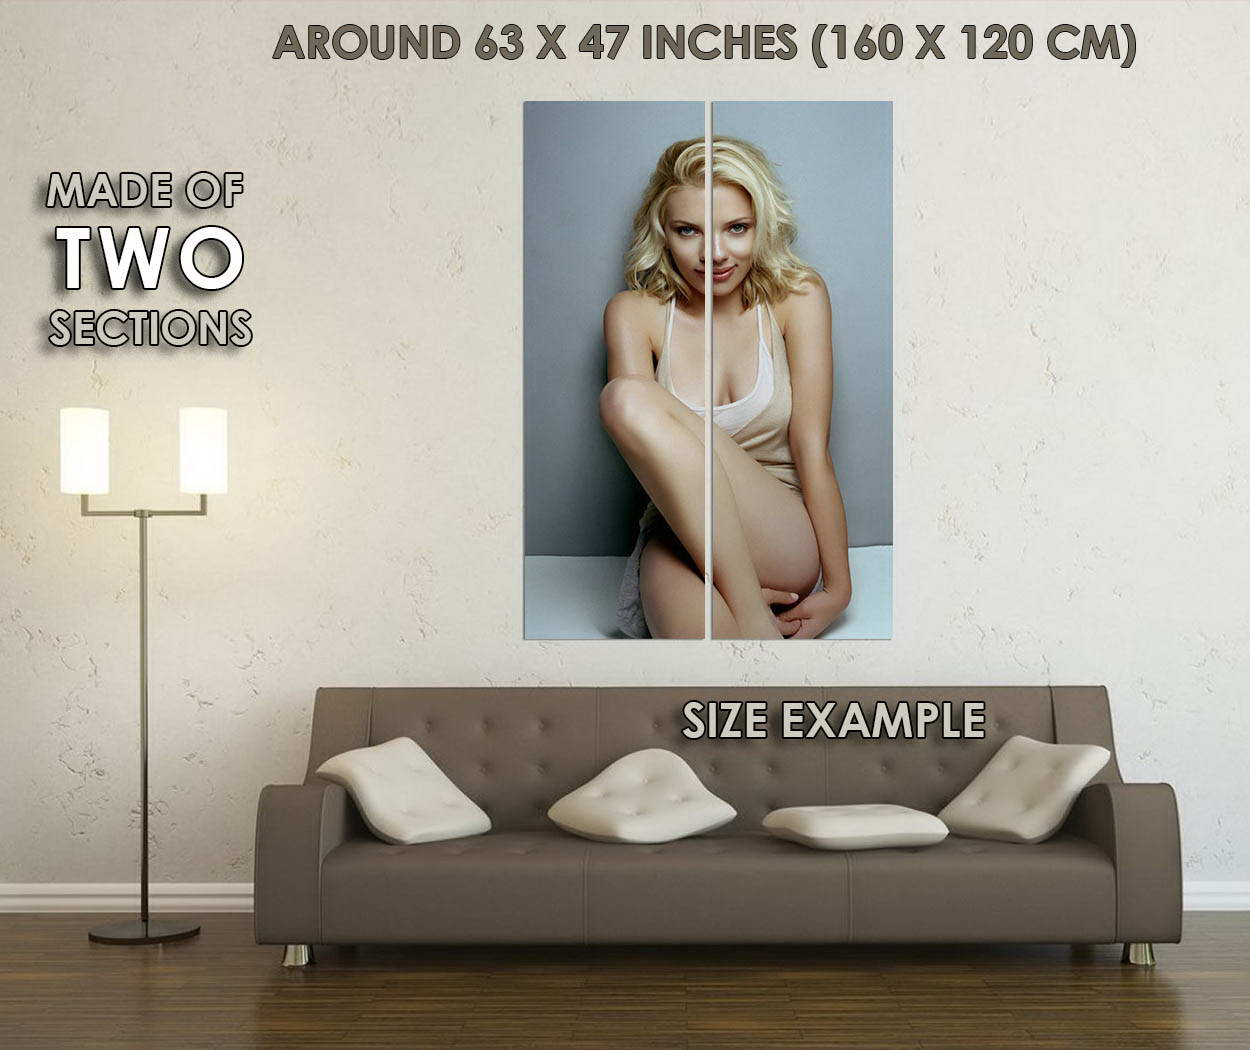 10103-Scarlett-Johansson-Sexy-Movie-Star-Black-Widow-LAMINATED-POSTER-CA thumbnail 6